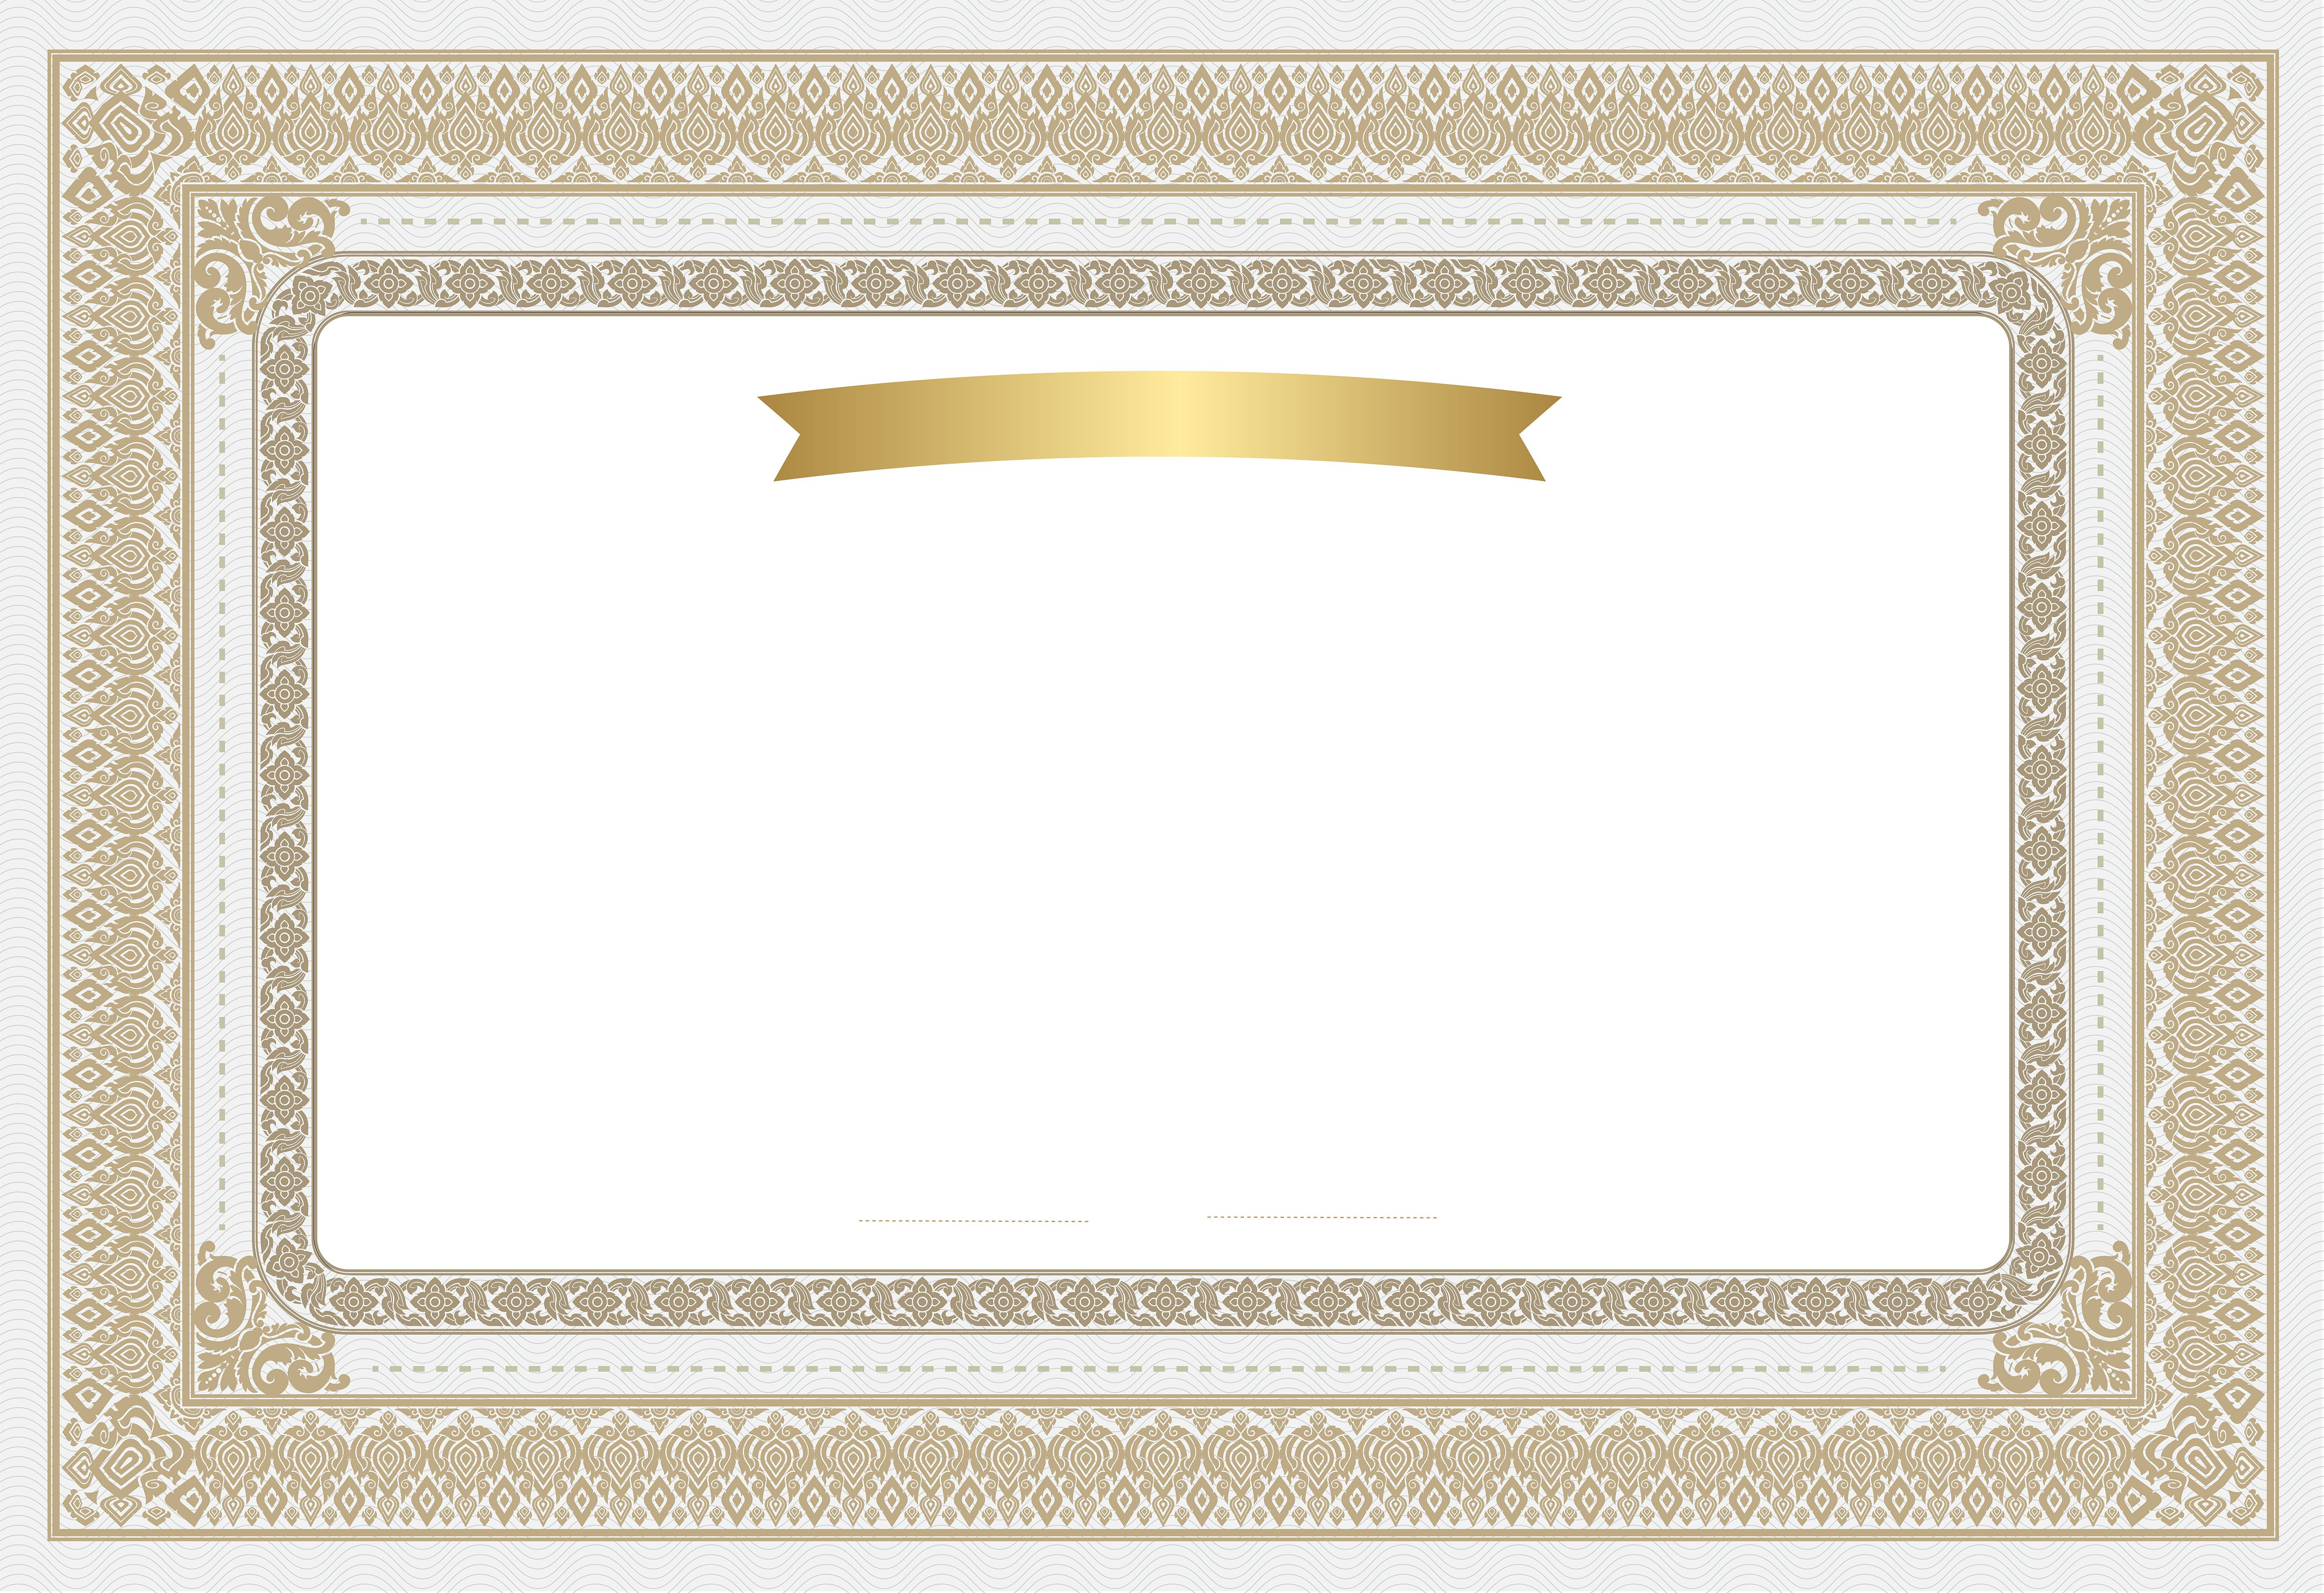 Empty Certificate Clip Art Image Gallery Yopriceville High Quality Images And Transparent Png Fr Frame Border Design Certificate Design Photo Frame Design